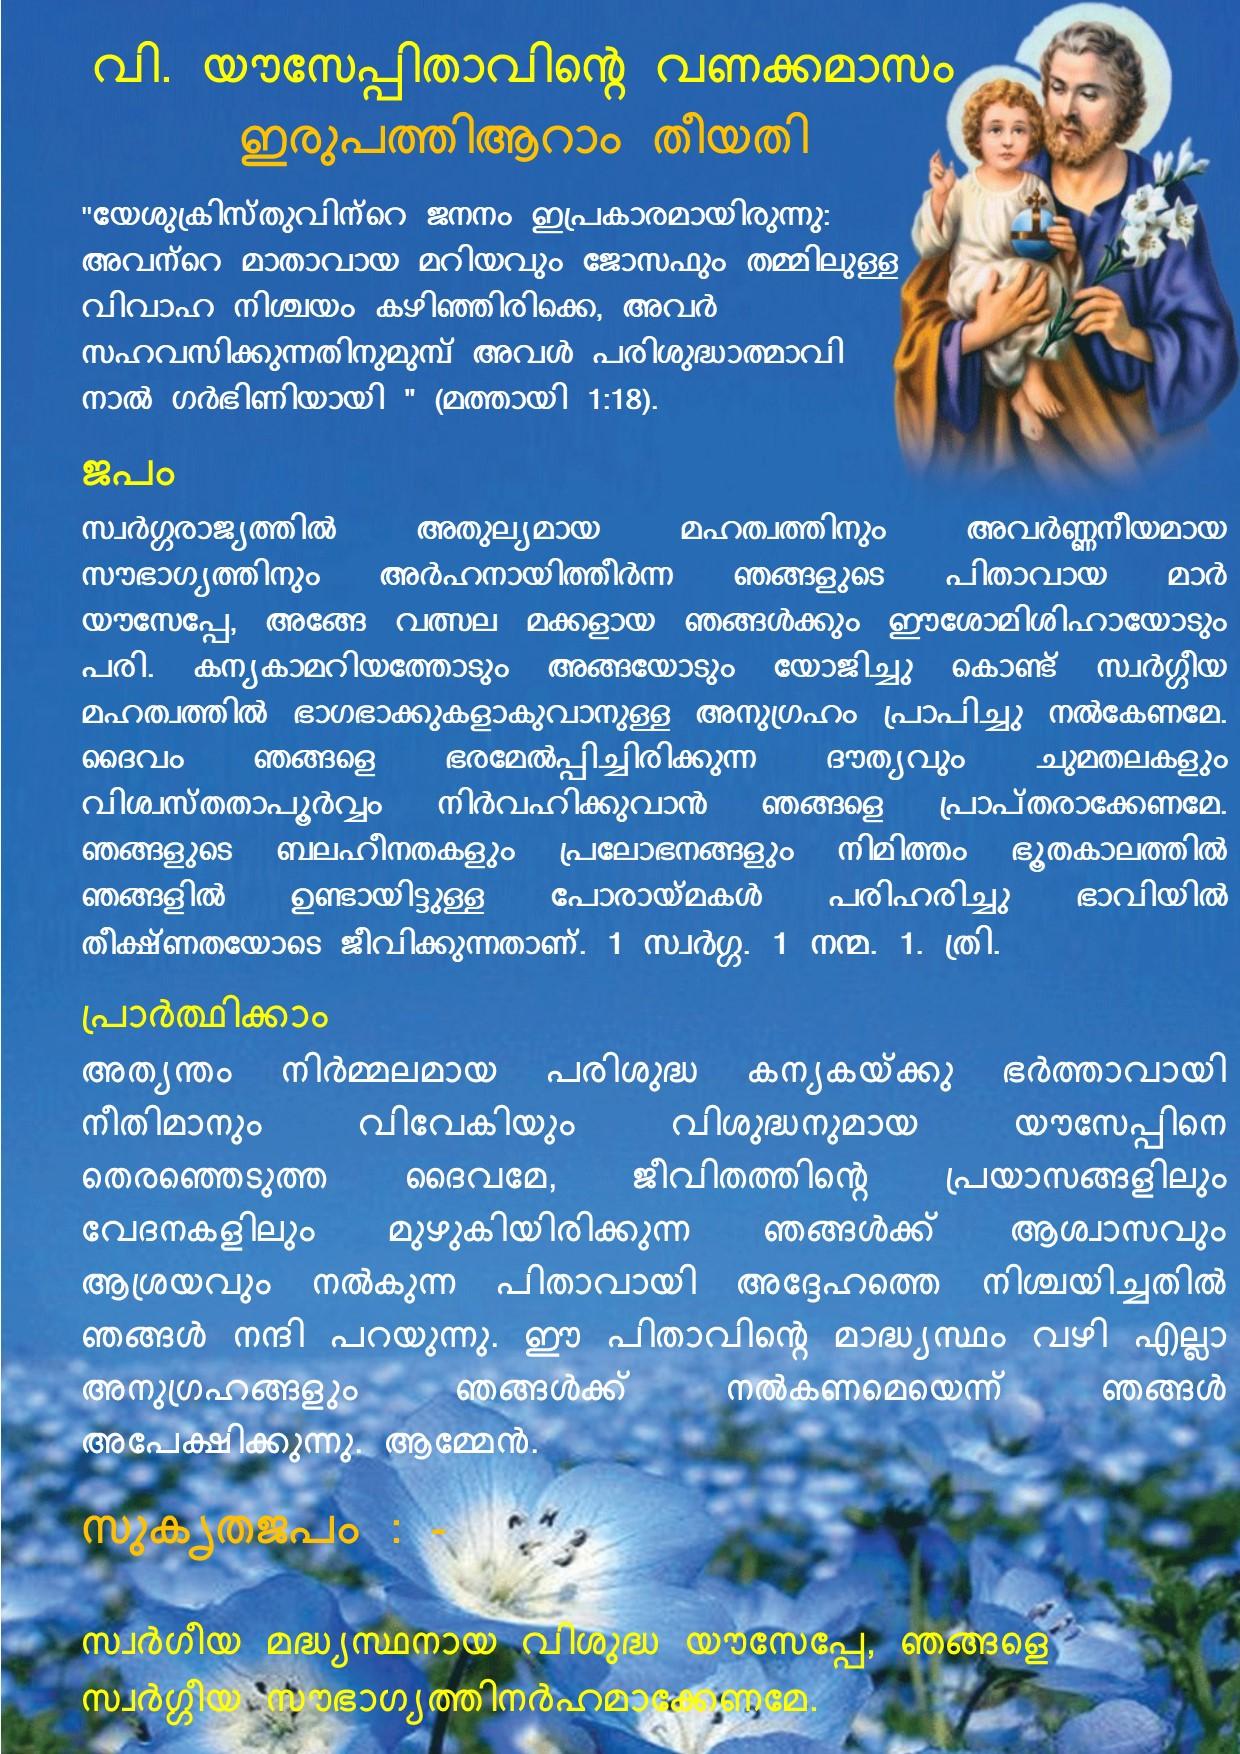 Vanakkamasam, St Joseph, March 26